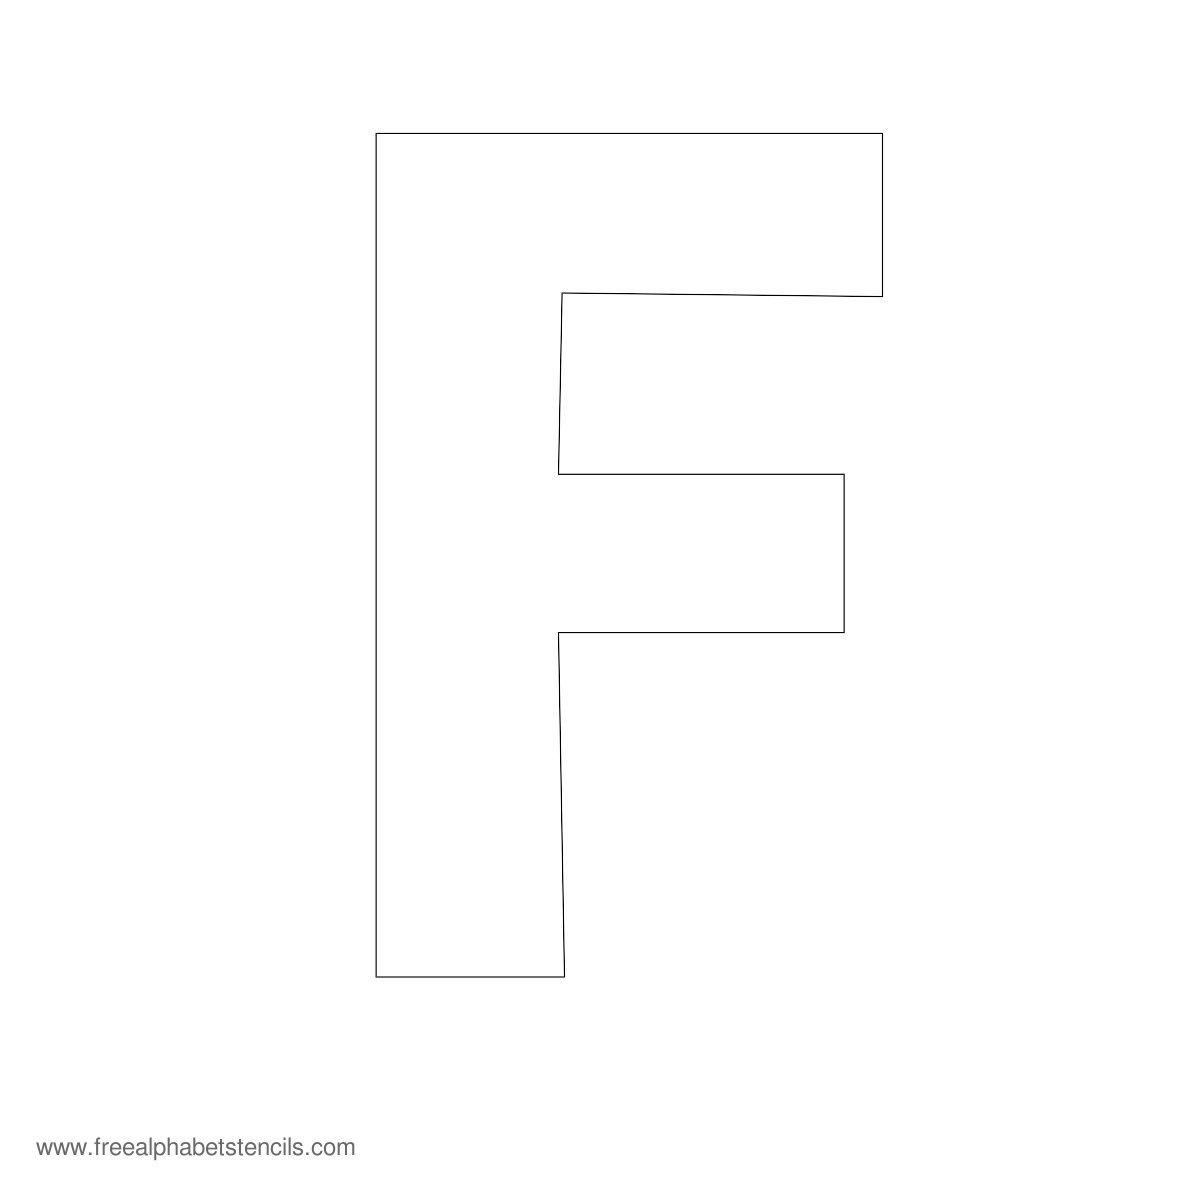 Large Alphabet Stencils   Freealphabetstencils - Free Printable 10 Inch Letter Stencils